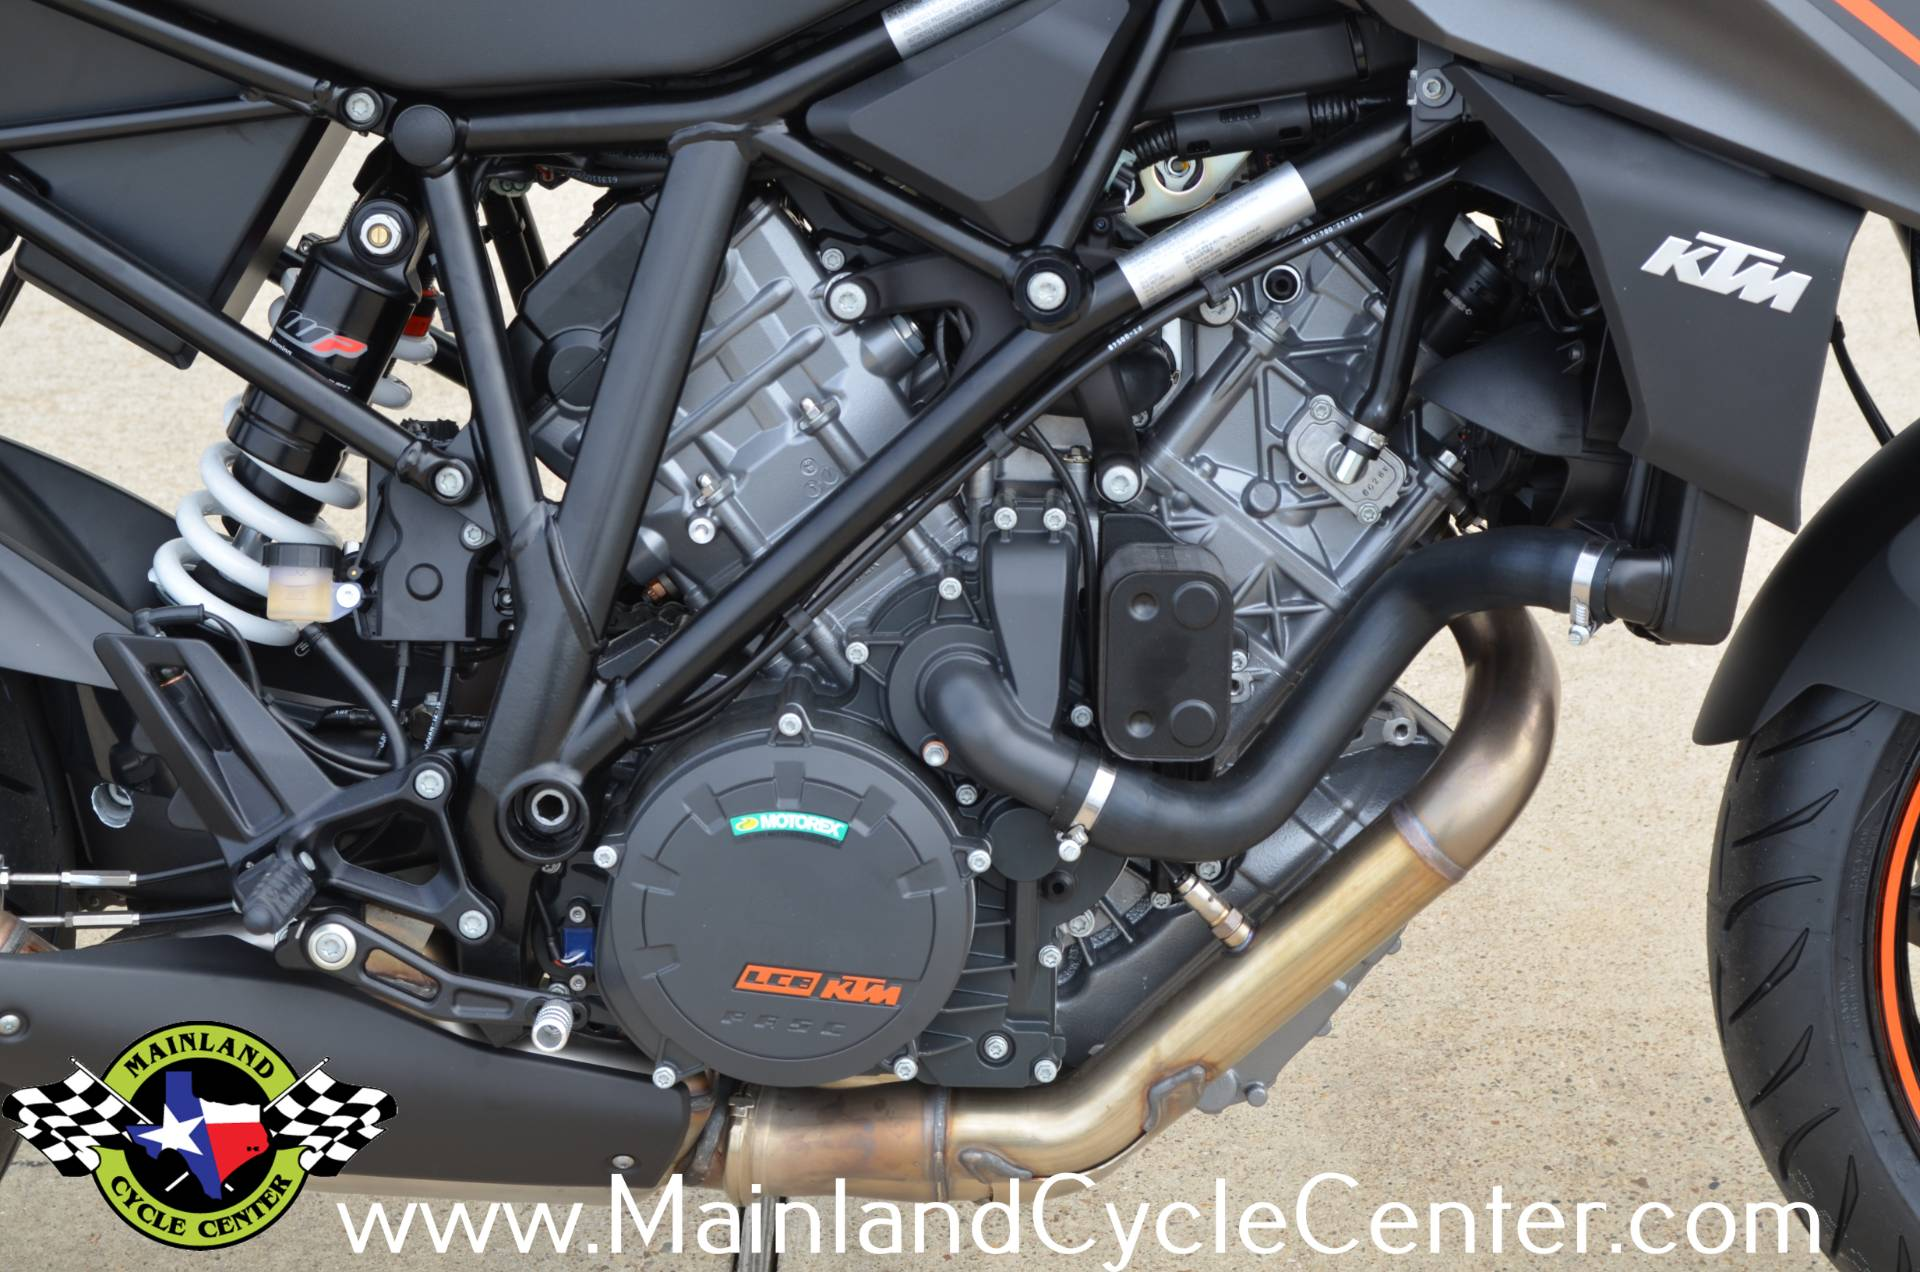 New 2018 KTM 1290 Super Duke R Motorcycles in La Marque, TX | Stock ...